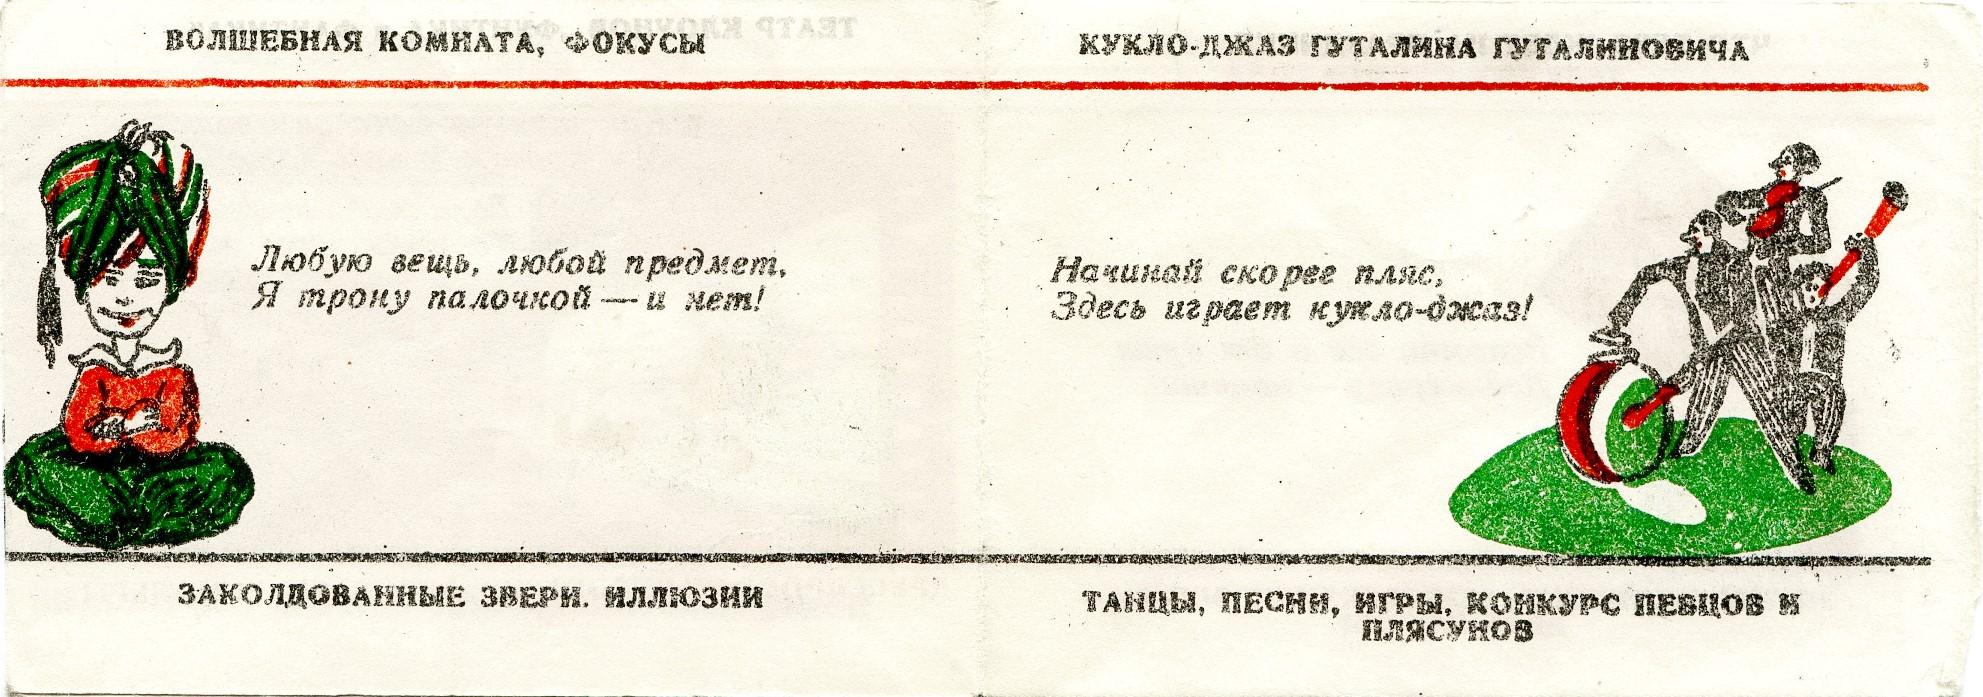 1946 программа006 кор.jpg